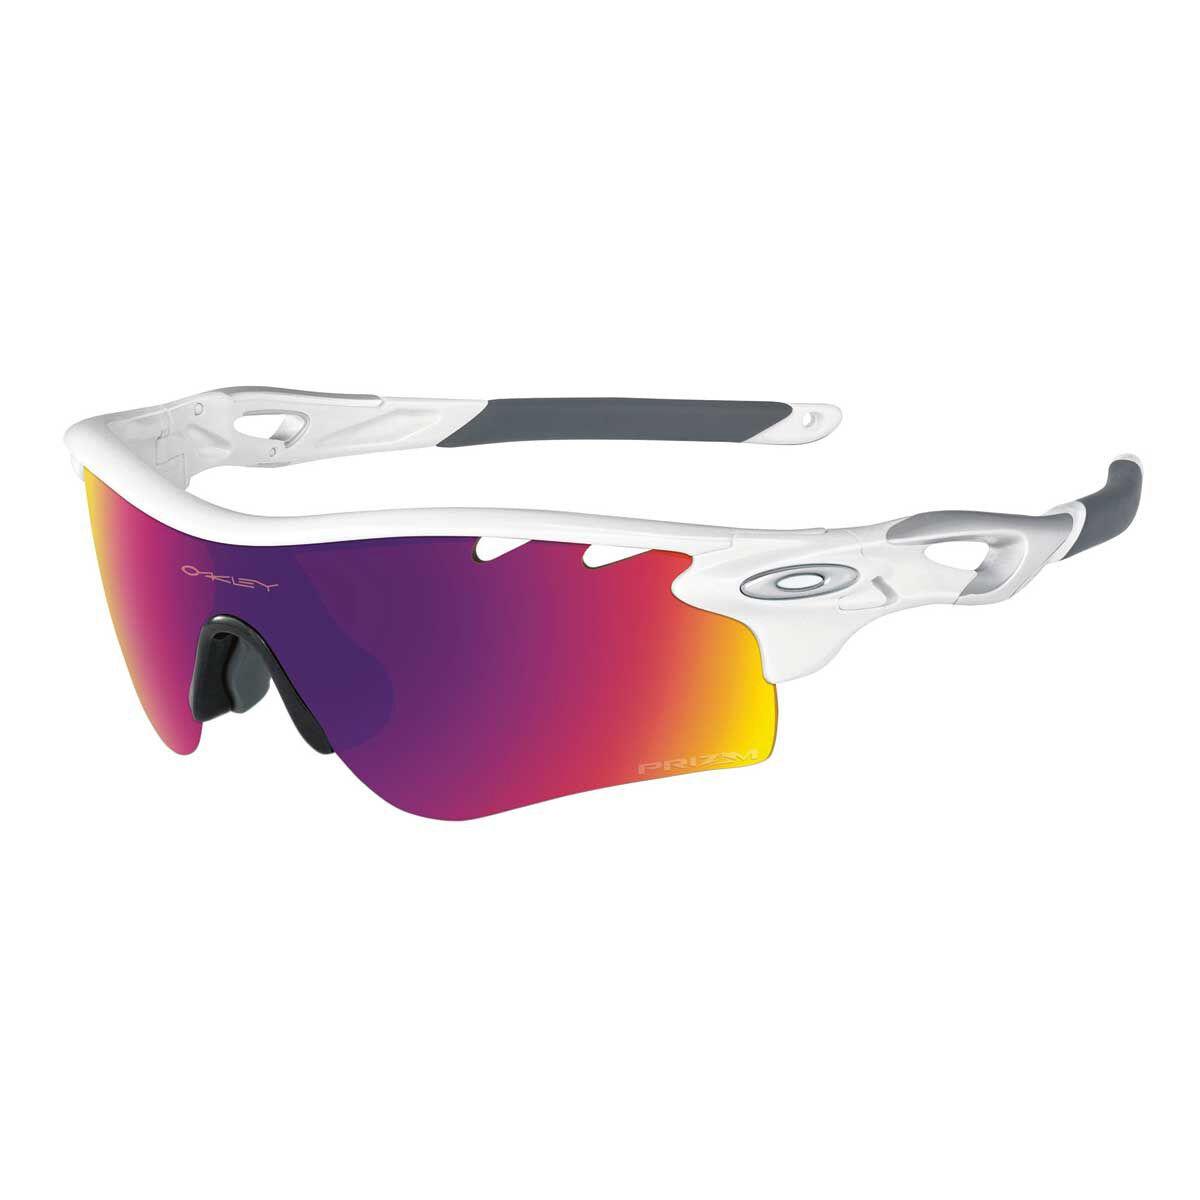 6500477e77 ... netherlands oakley radarlock path prizm road sunglasses white rebelhi  res fabe9 630b9